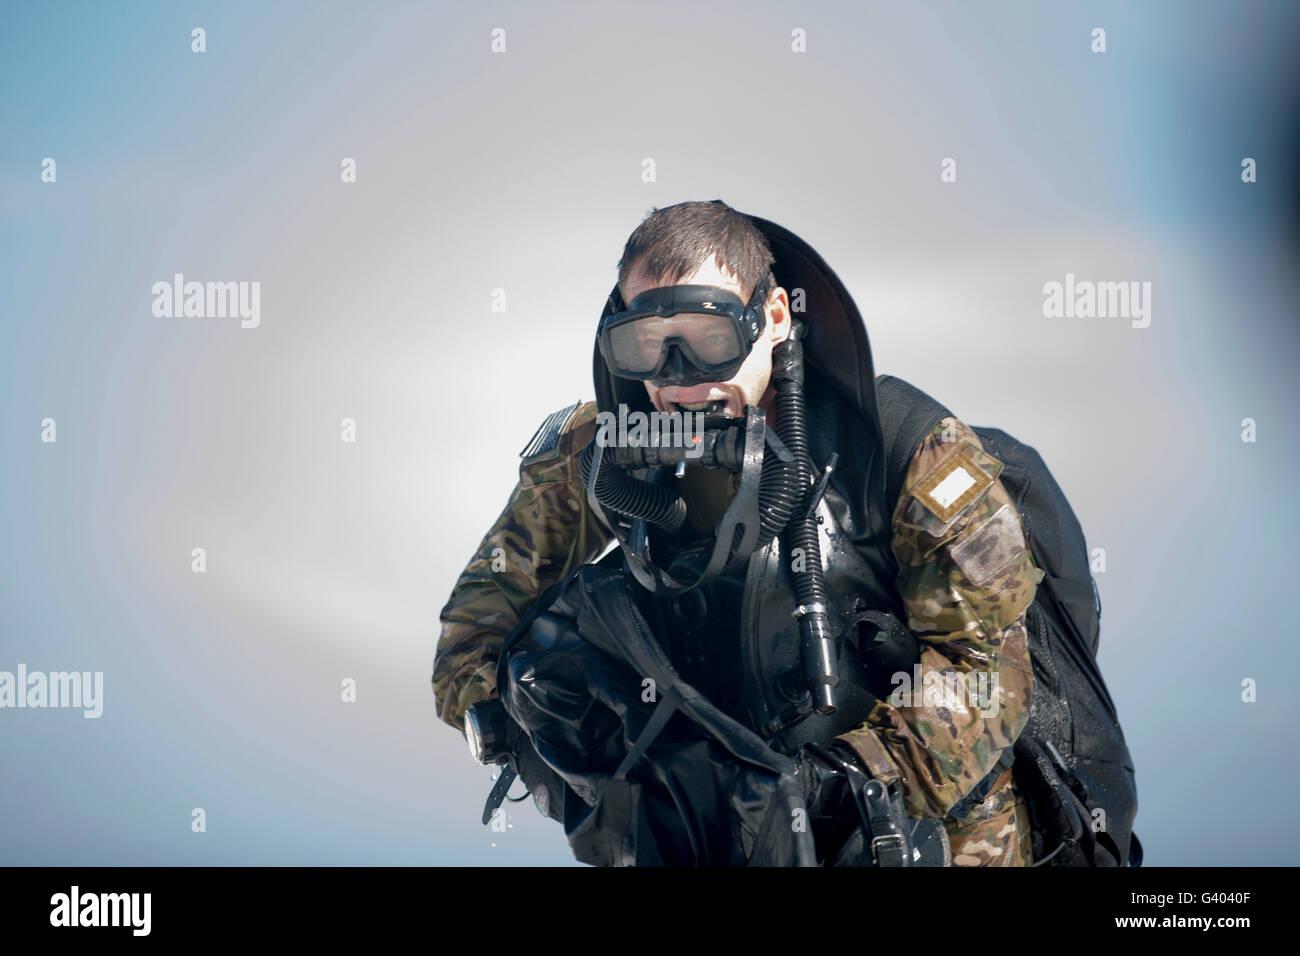 A Green Beret emerges onto Okaloosa Island. - Stock Image